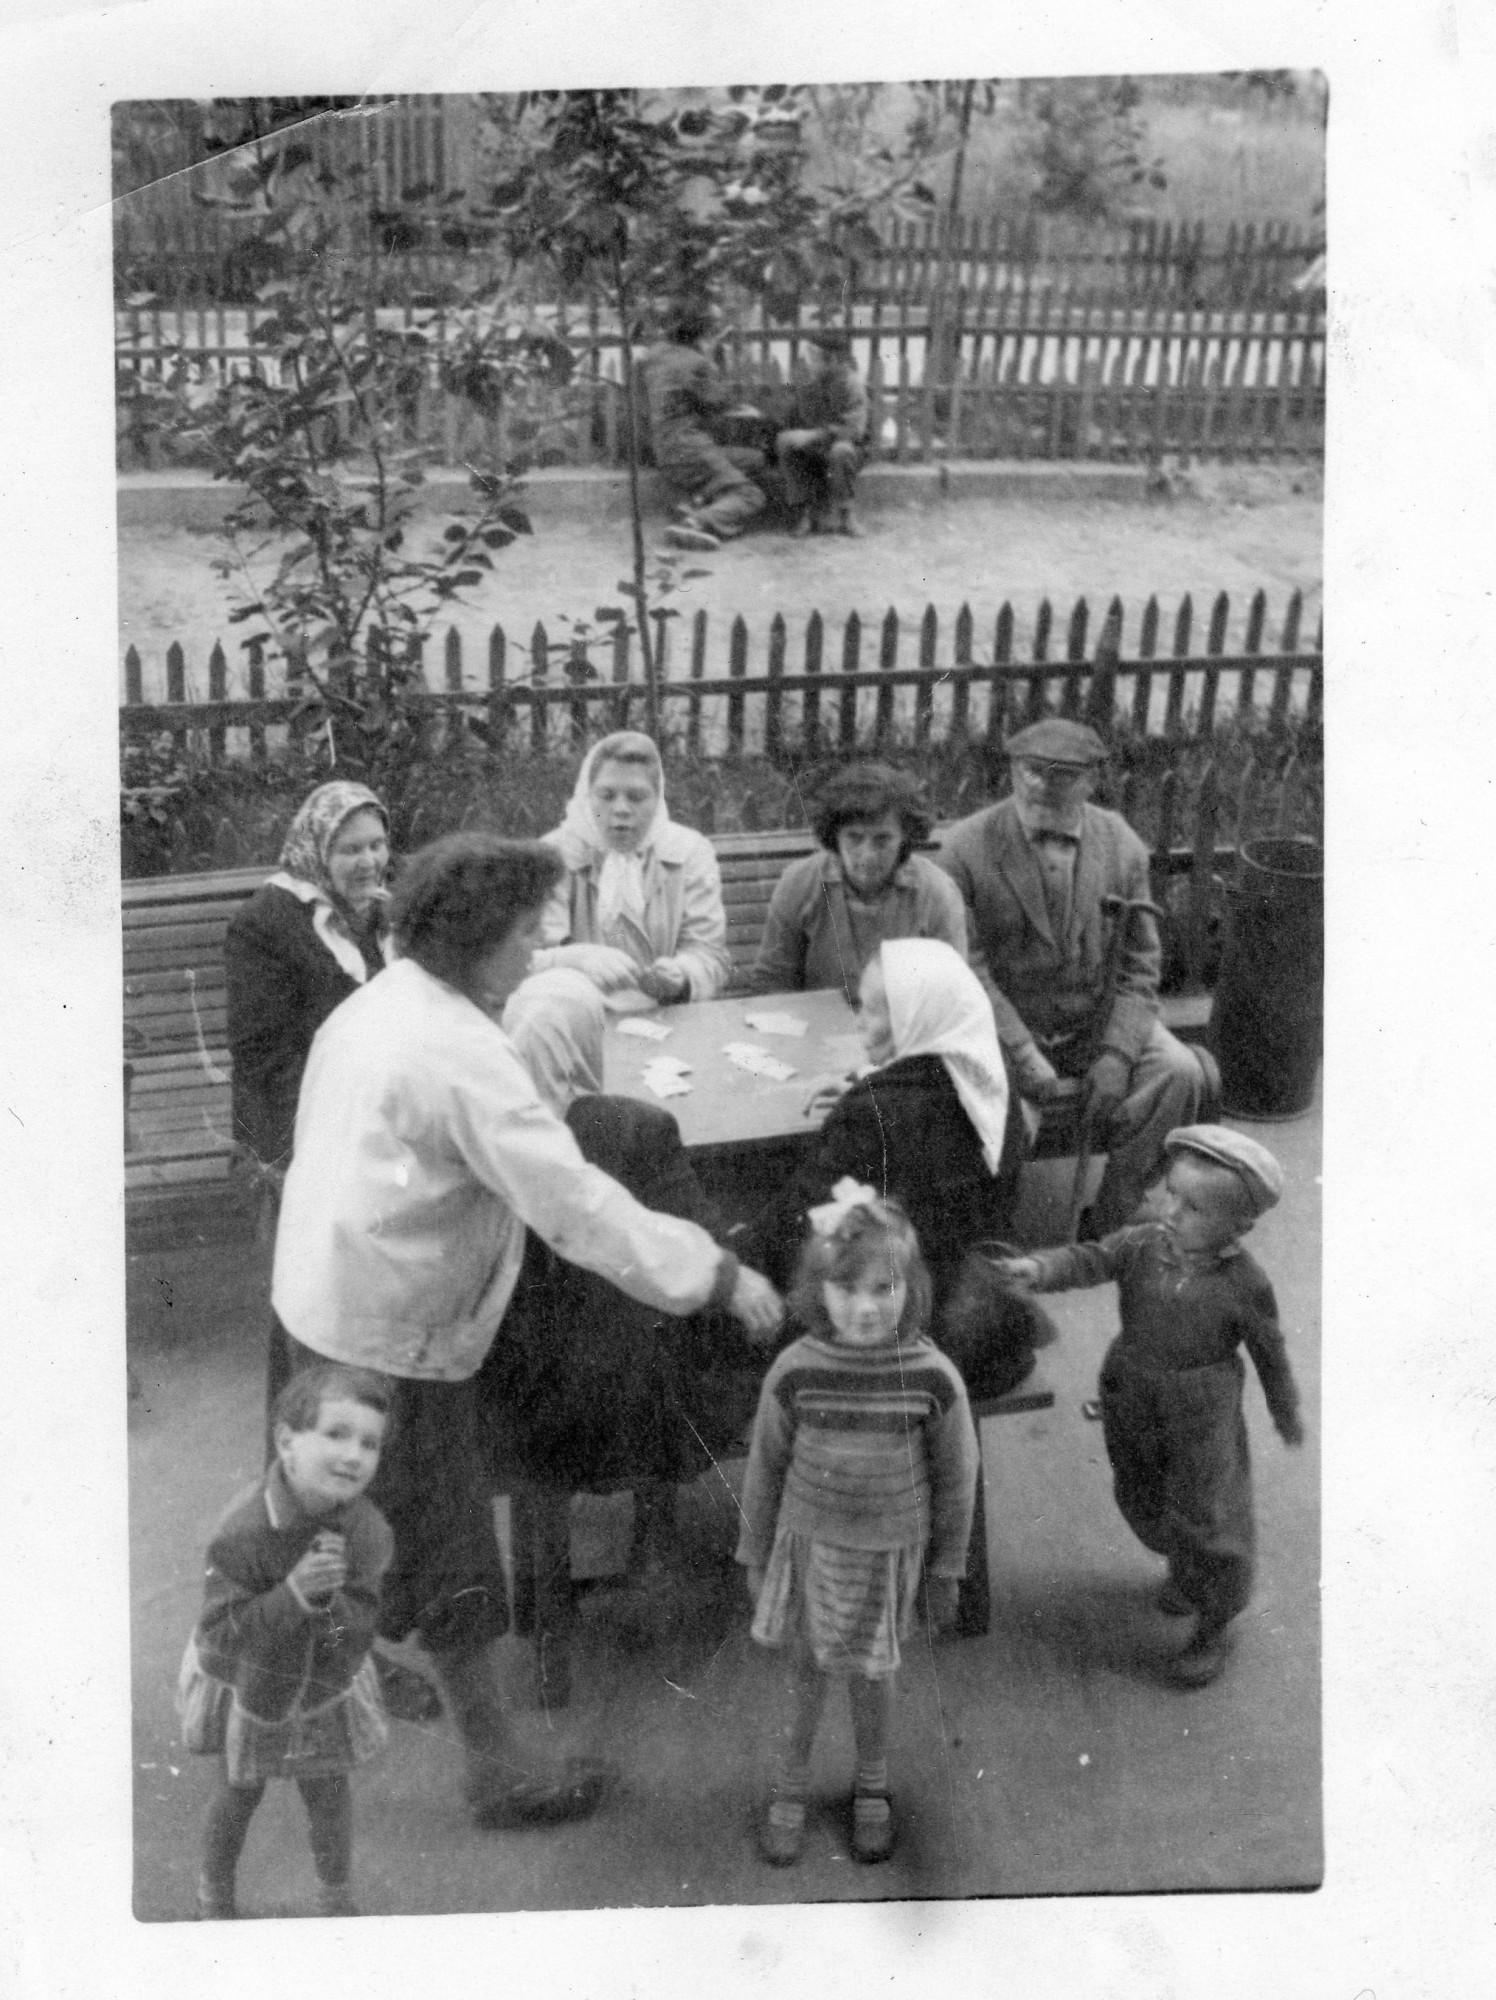 1966 Ул. Ленина д 21. Сейчас Б. Очаковская д 33, наш двор. Любовь Куклина